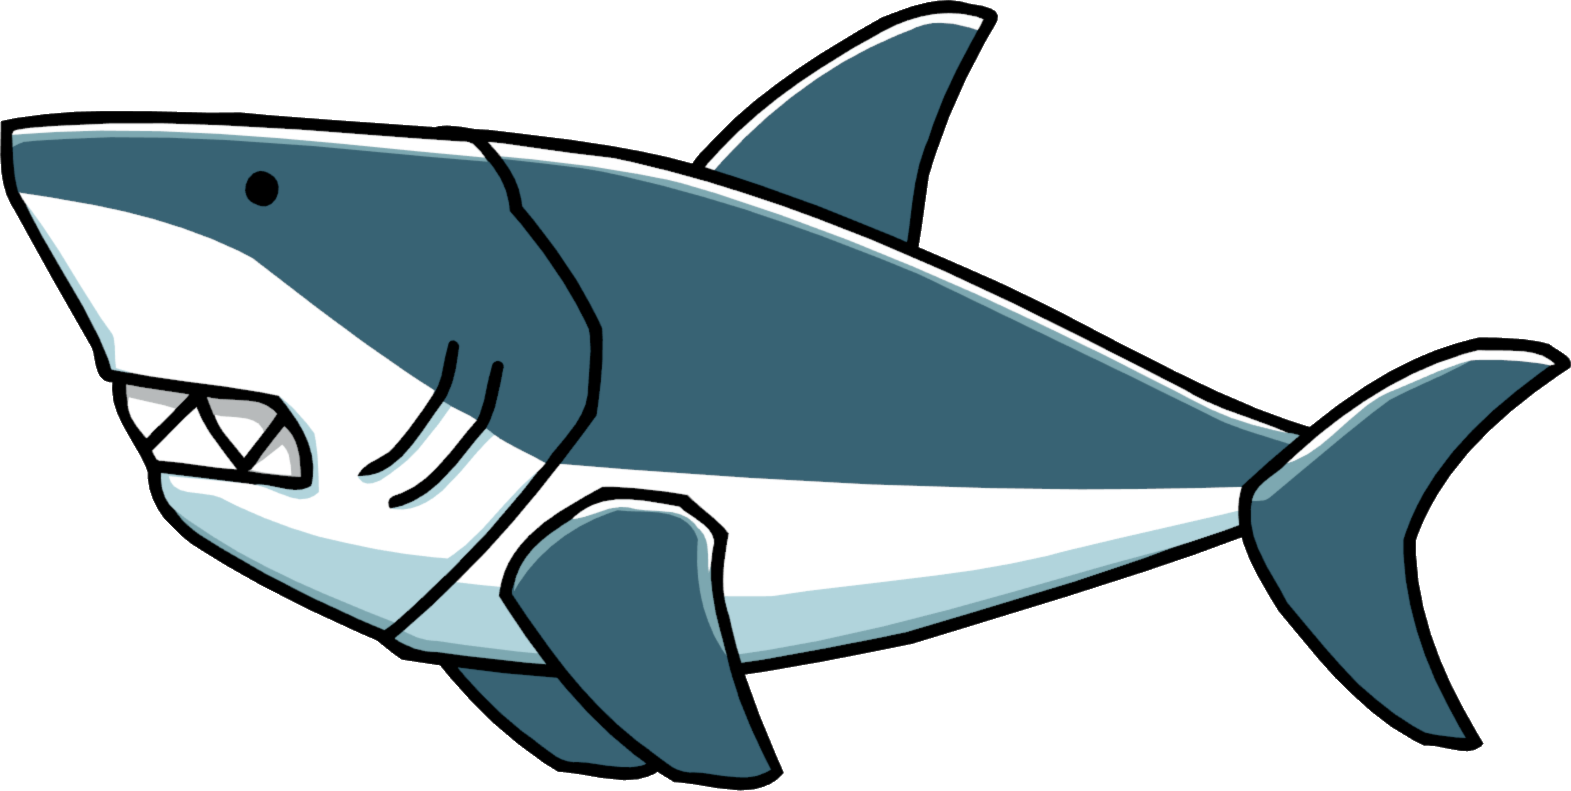 1571x791 Shark Clipart Png Transparent